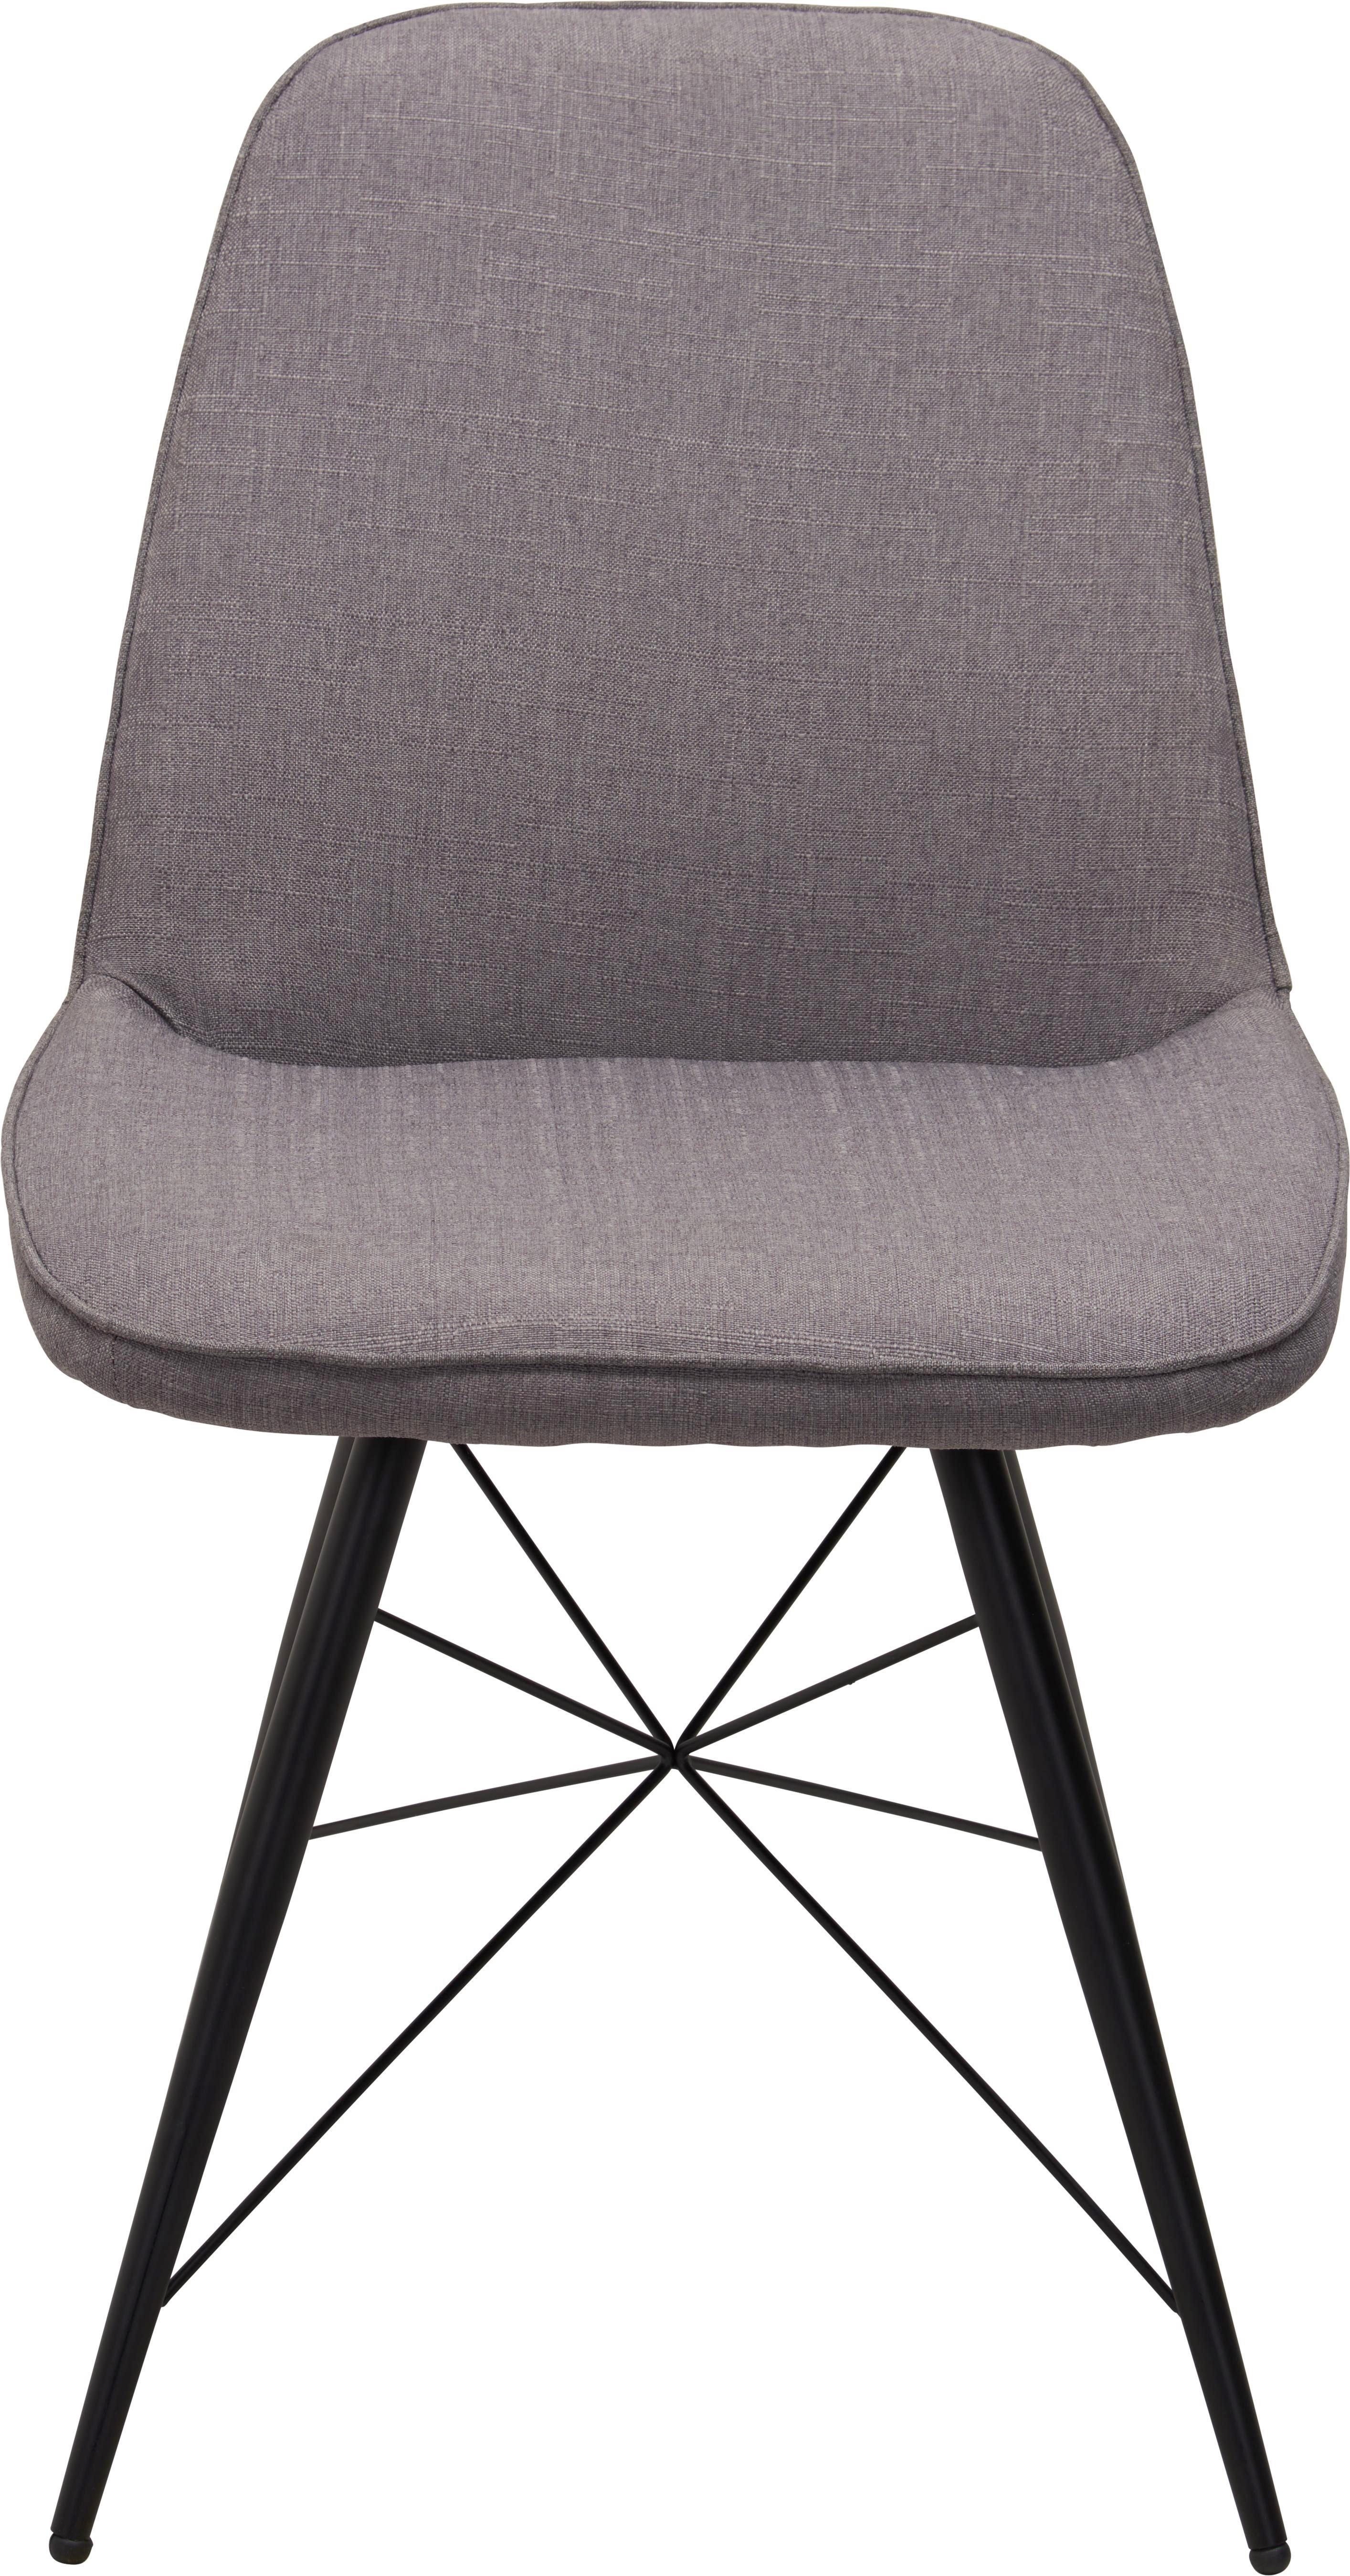 Stuhl In Stuhl In GrauSchwarz MetallTextil 4j3q5RLA